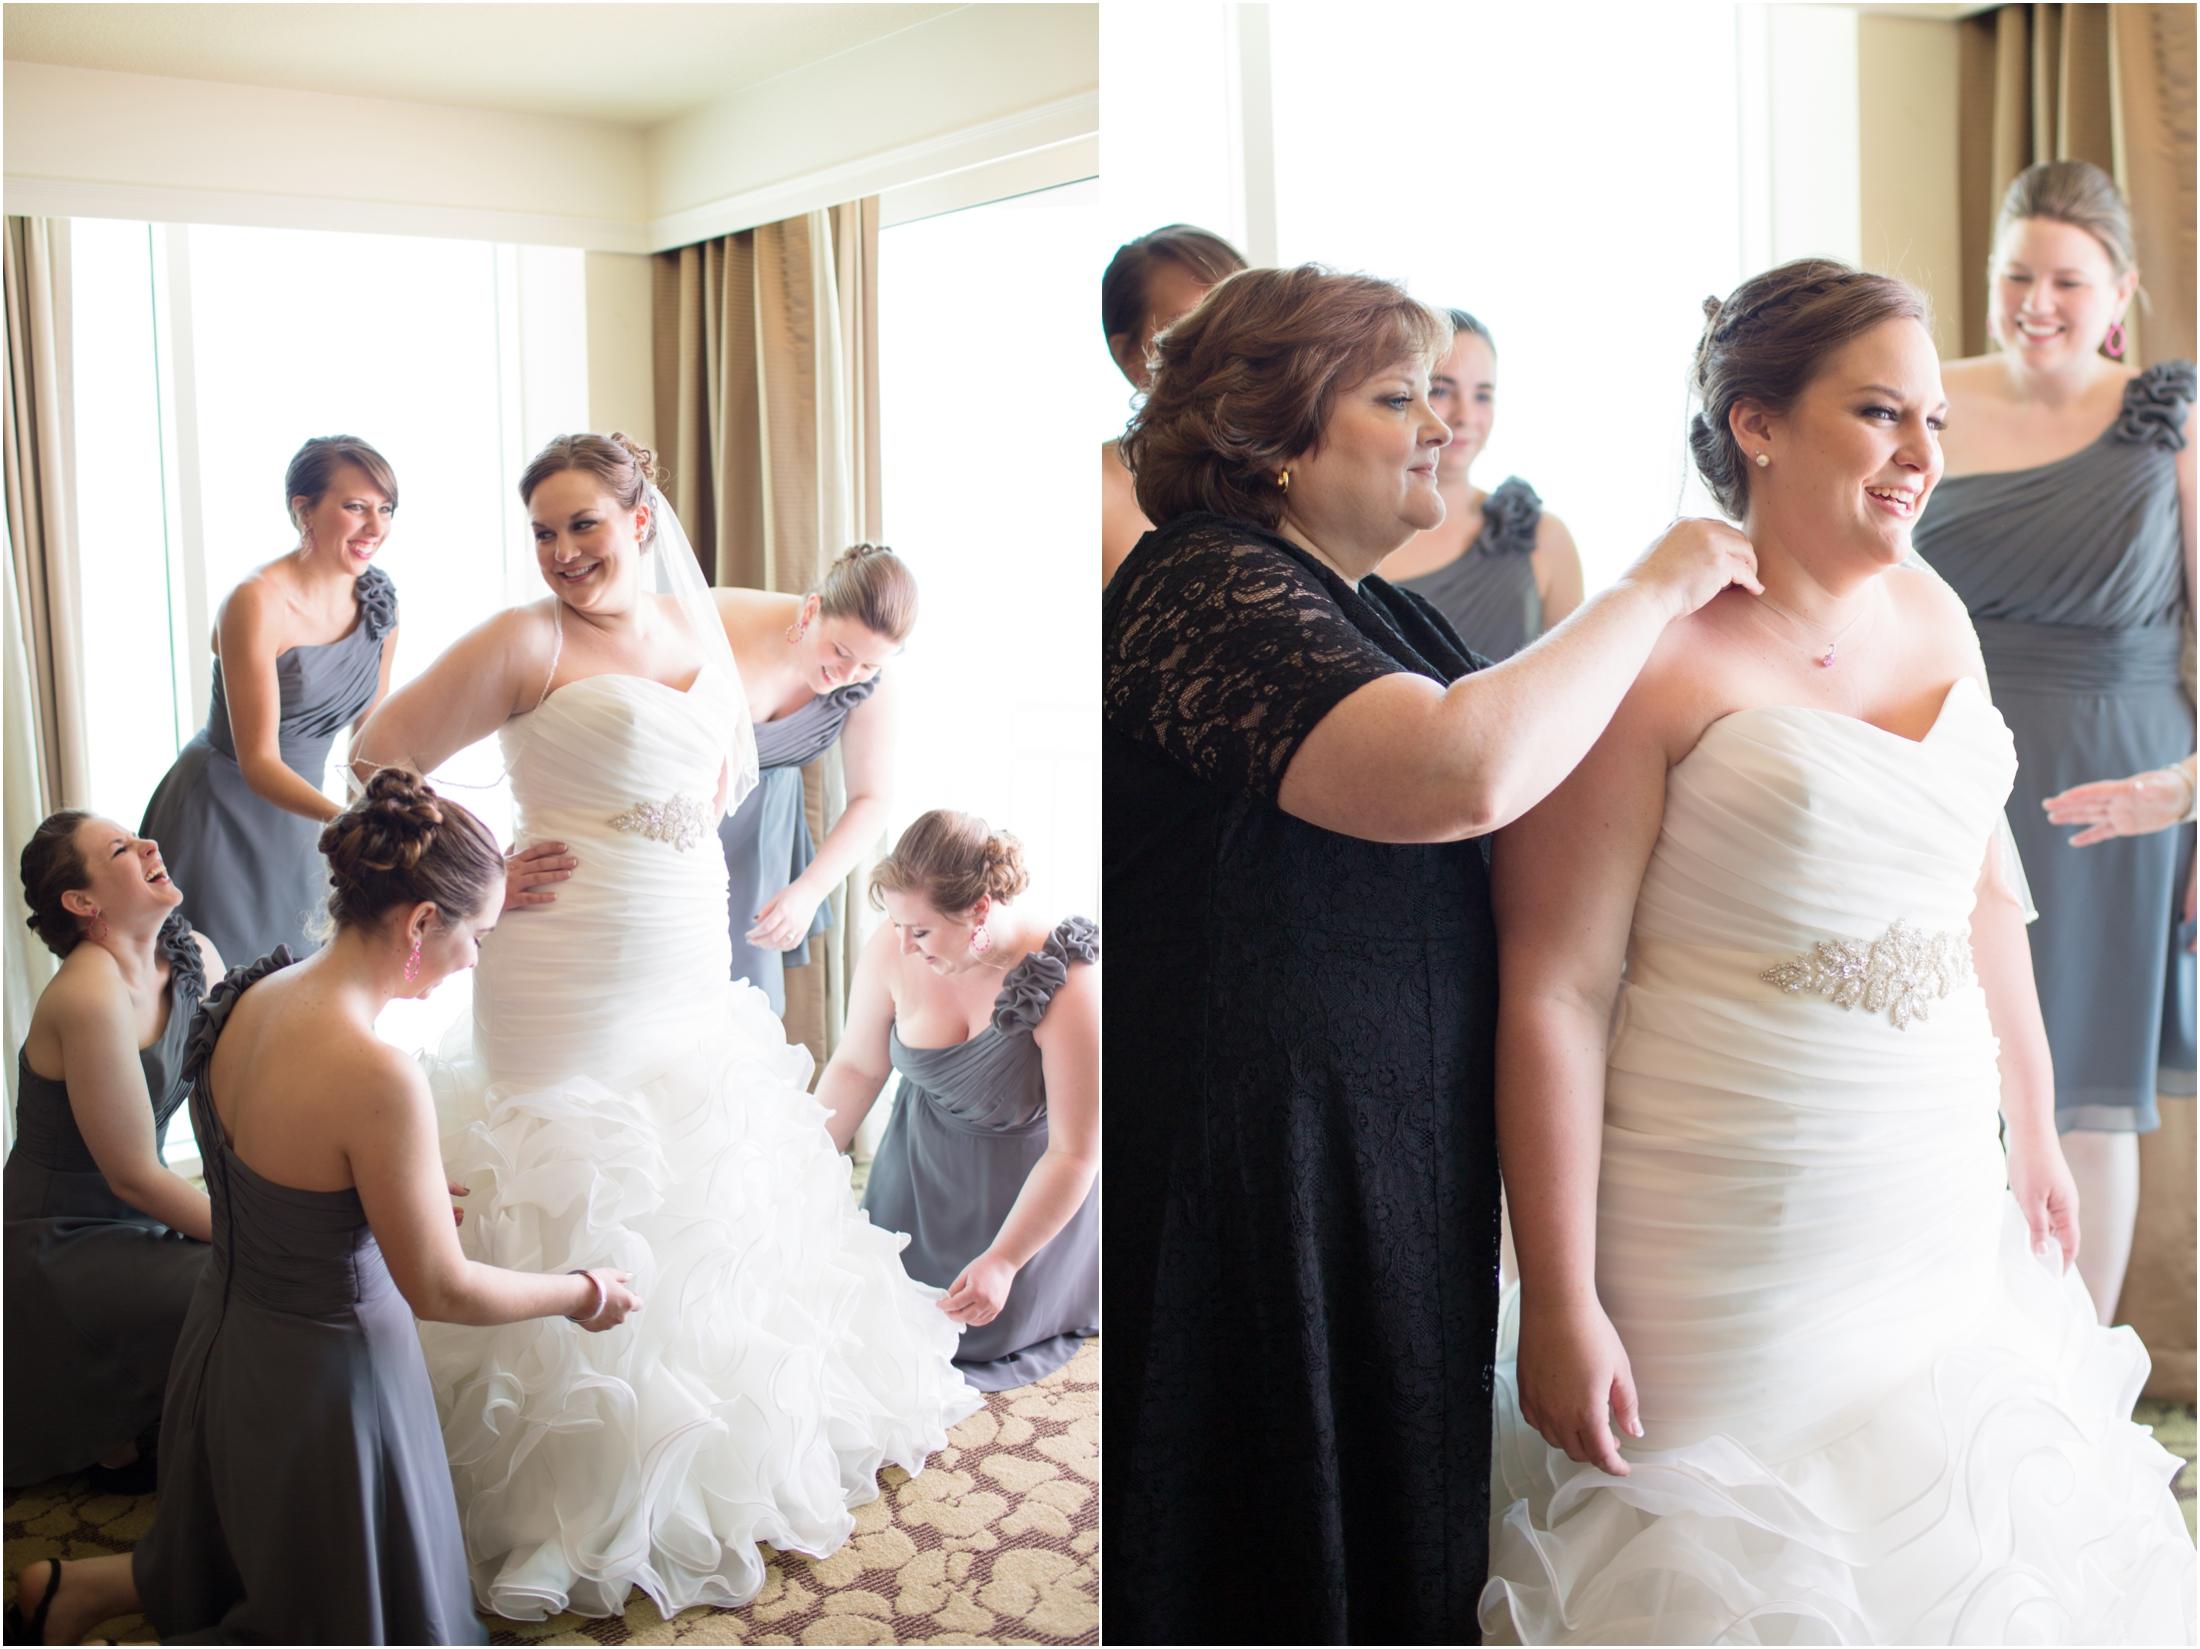 1-Lambert-Wedding-Details-Getting-Ready-604.jpg